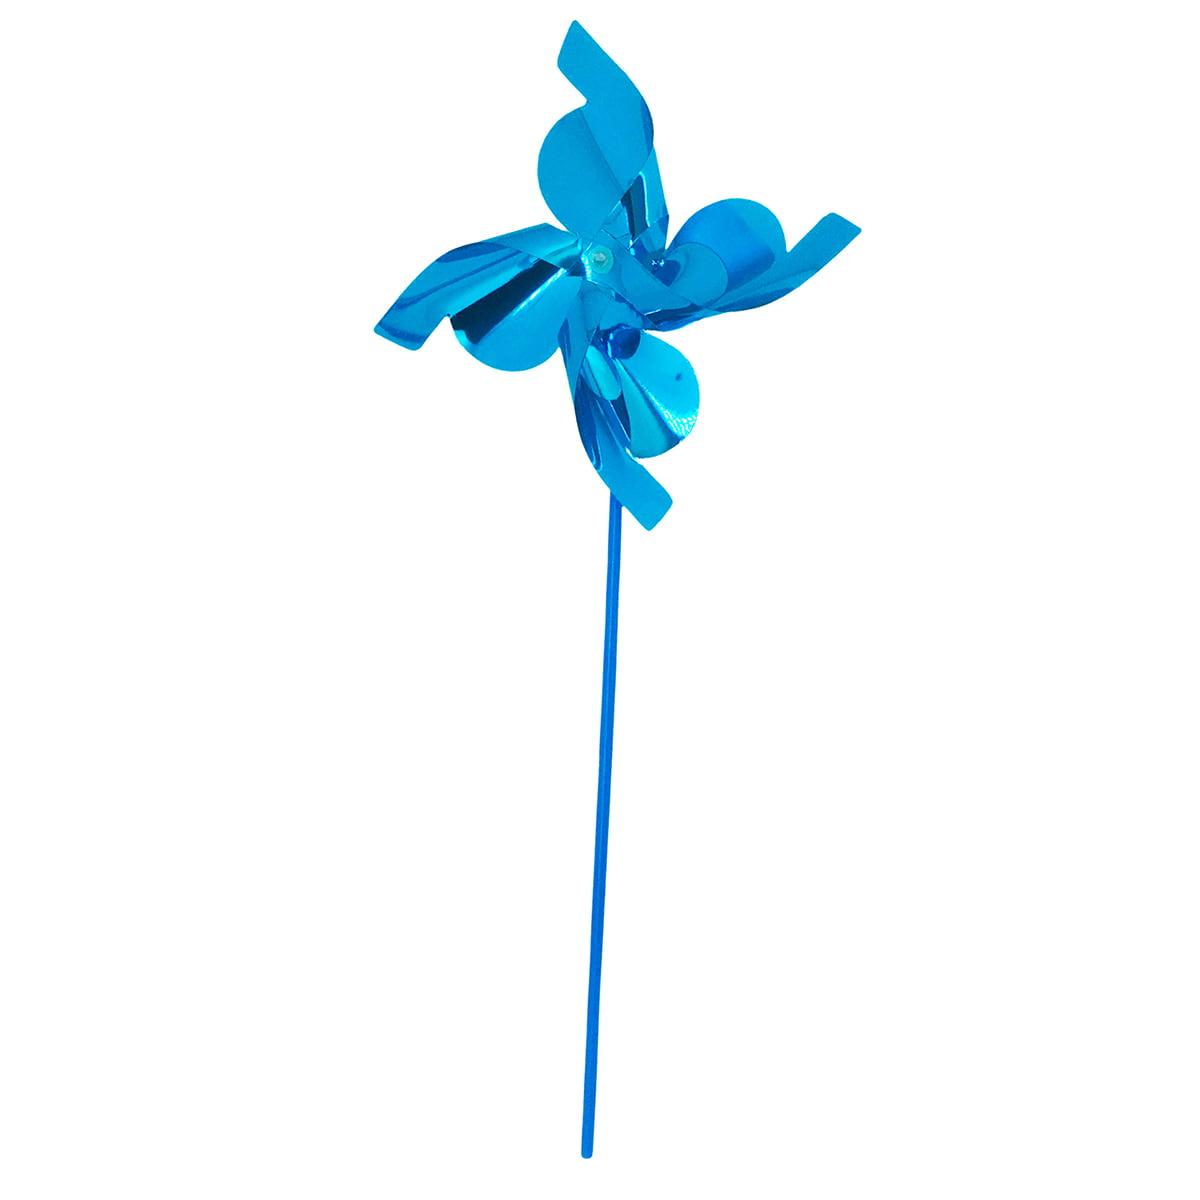 Catavento Metalizado Azul Claro - 12 unidades